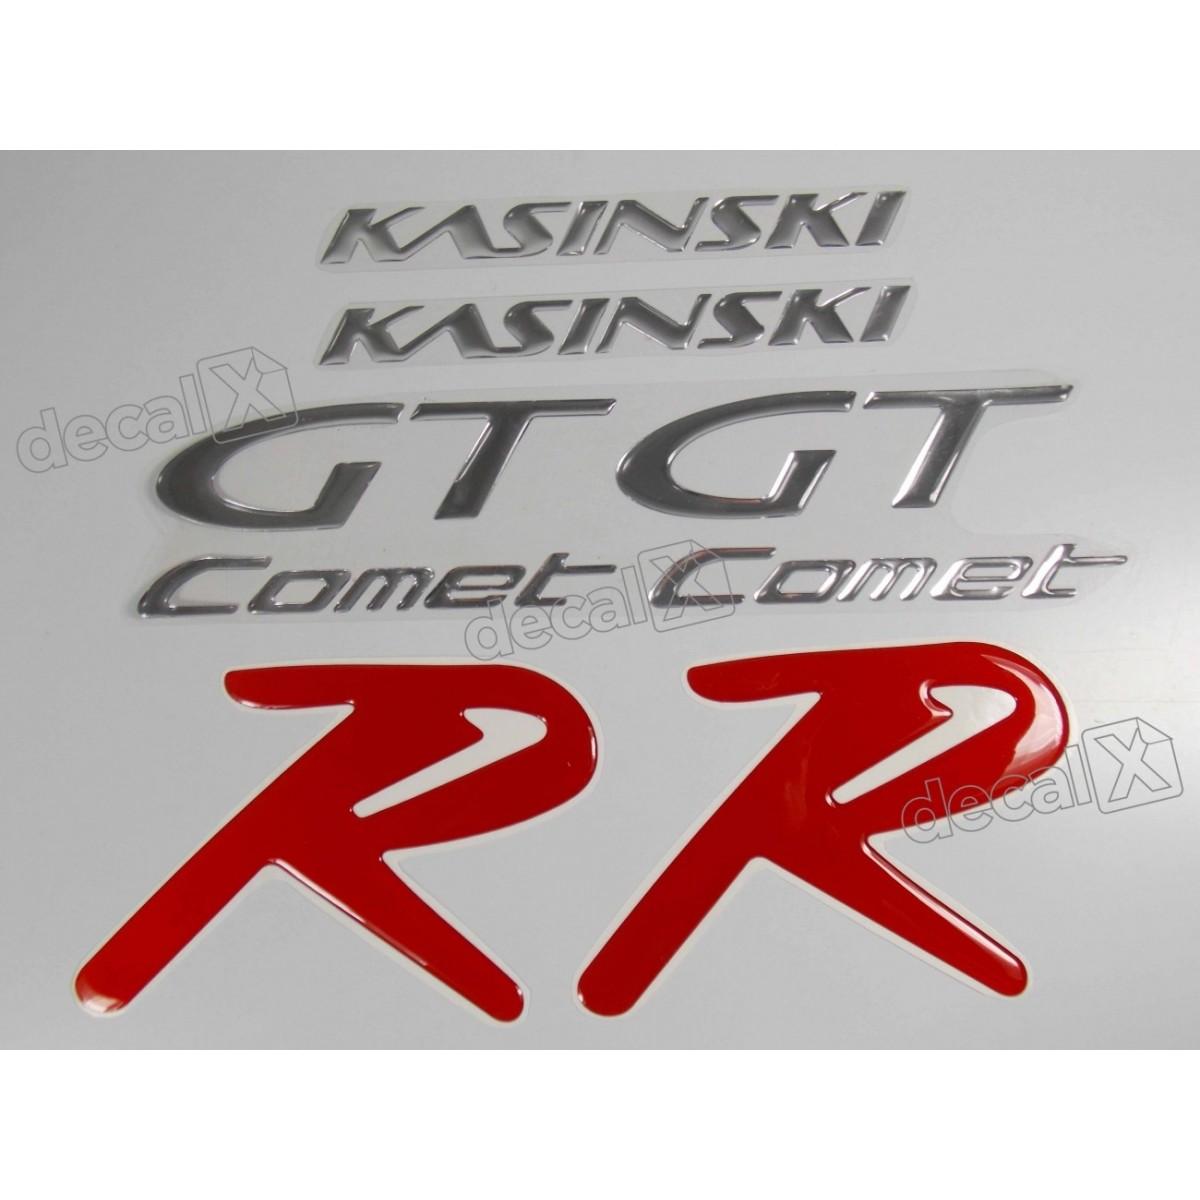 Kit Adesivos Kasinski Comet Gtr Resinado Vermelho Rs7 Decalx